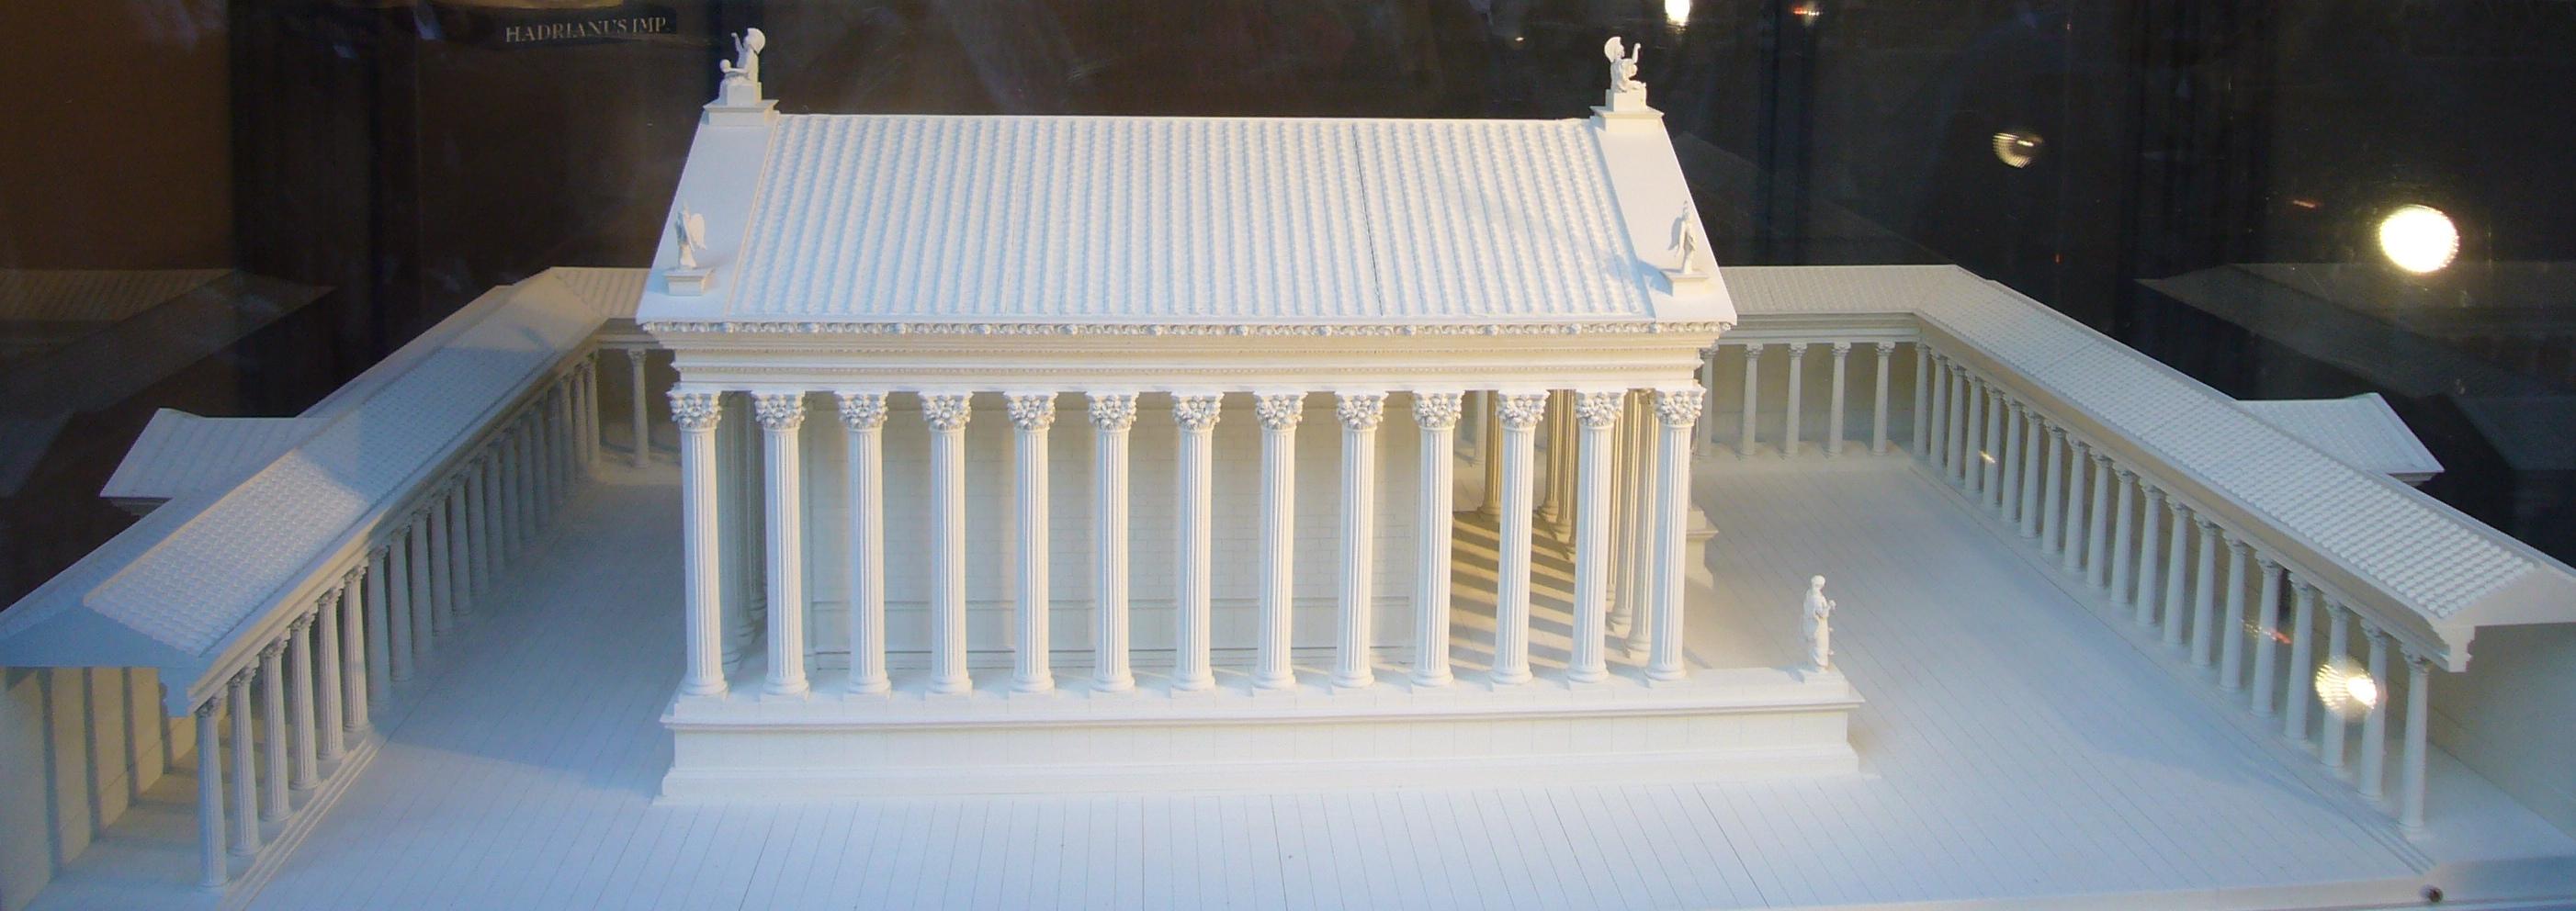 Reconstruction of the Hadrianeum